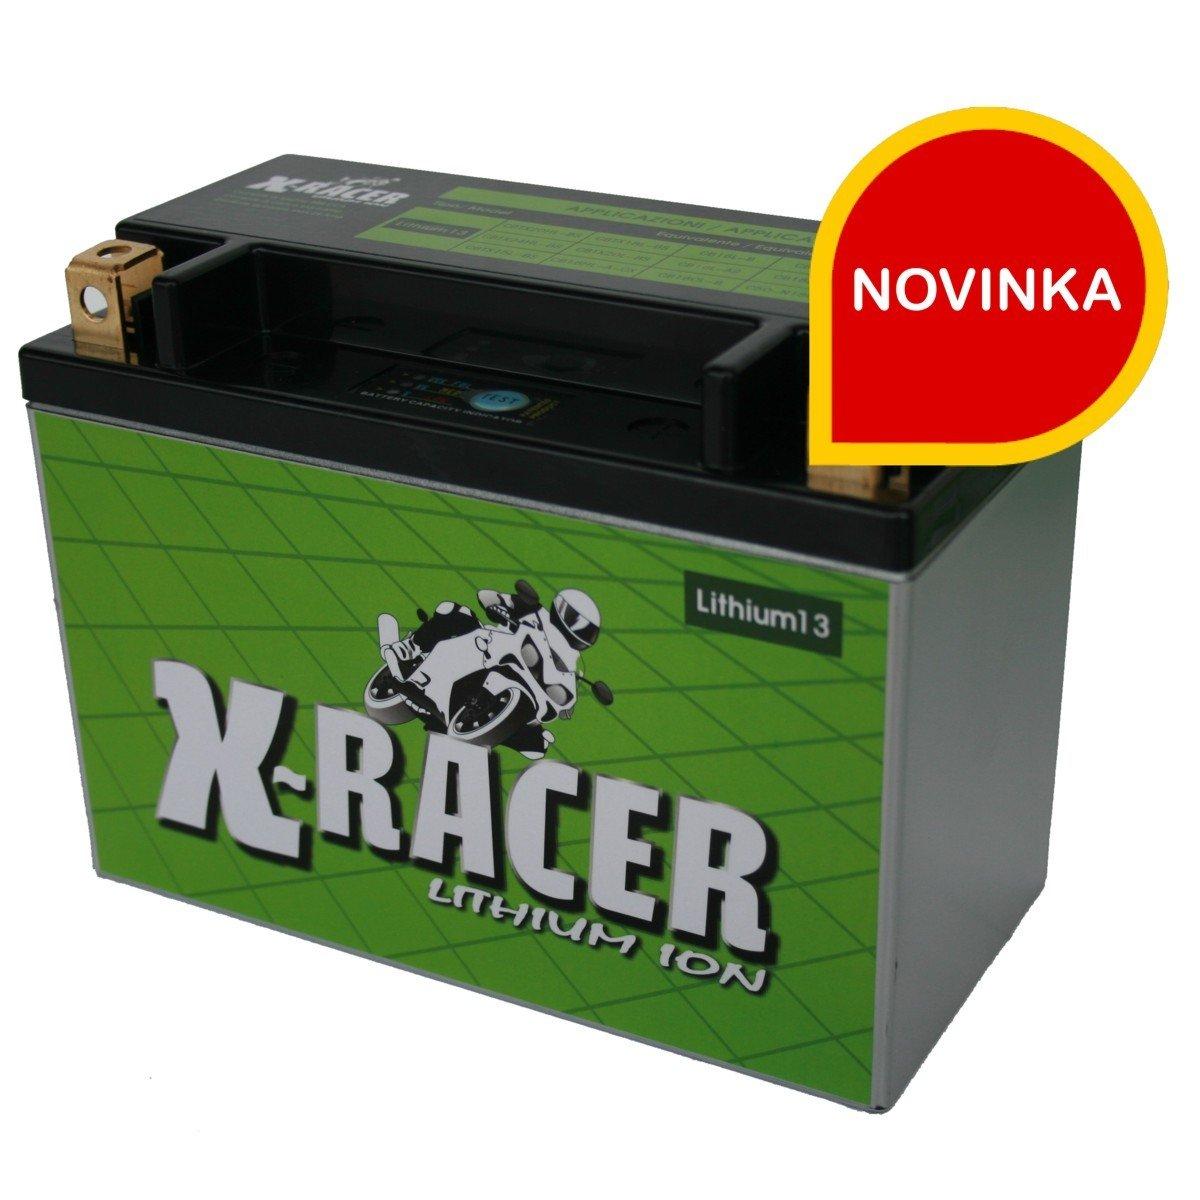 X-RACER Lithium13